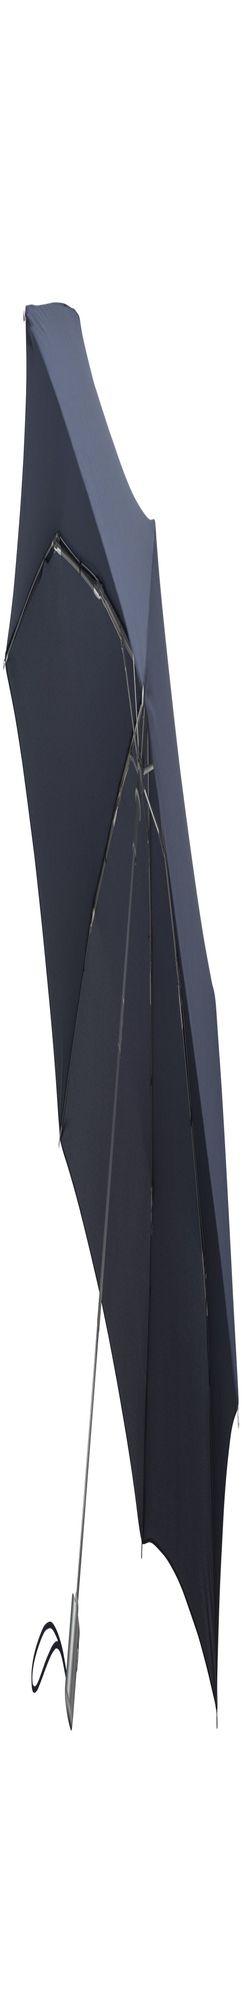 Складной зонт Alu Drop, 3 сложения, 7 спиц, автомат, темно-синий фото